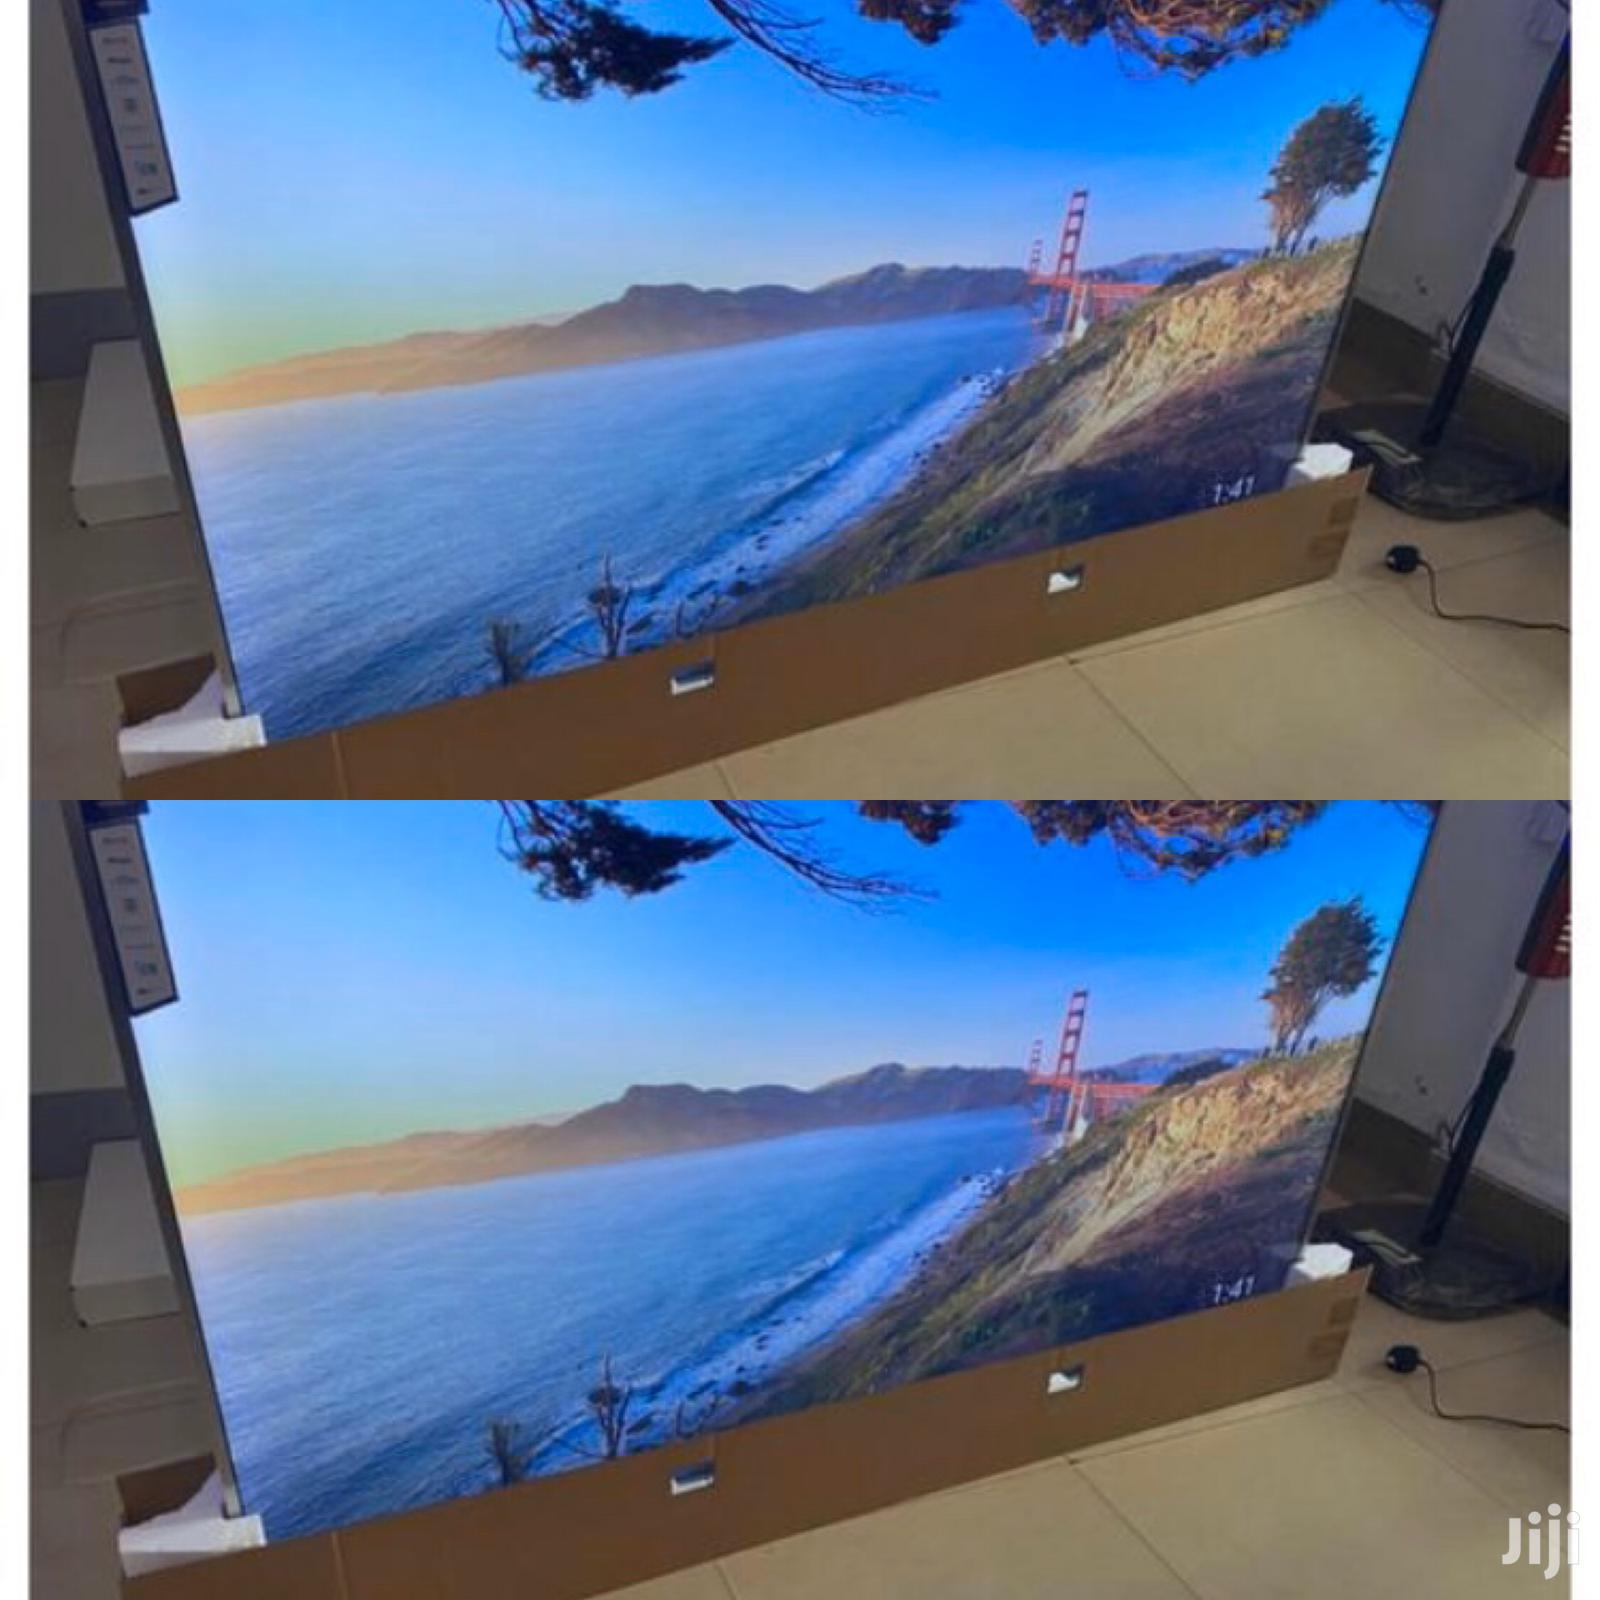 Changhong 55 Inch 4K Smart Android Frameless